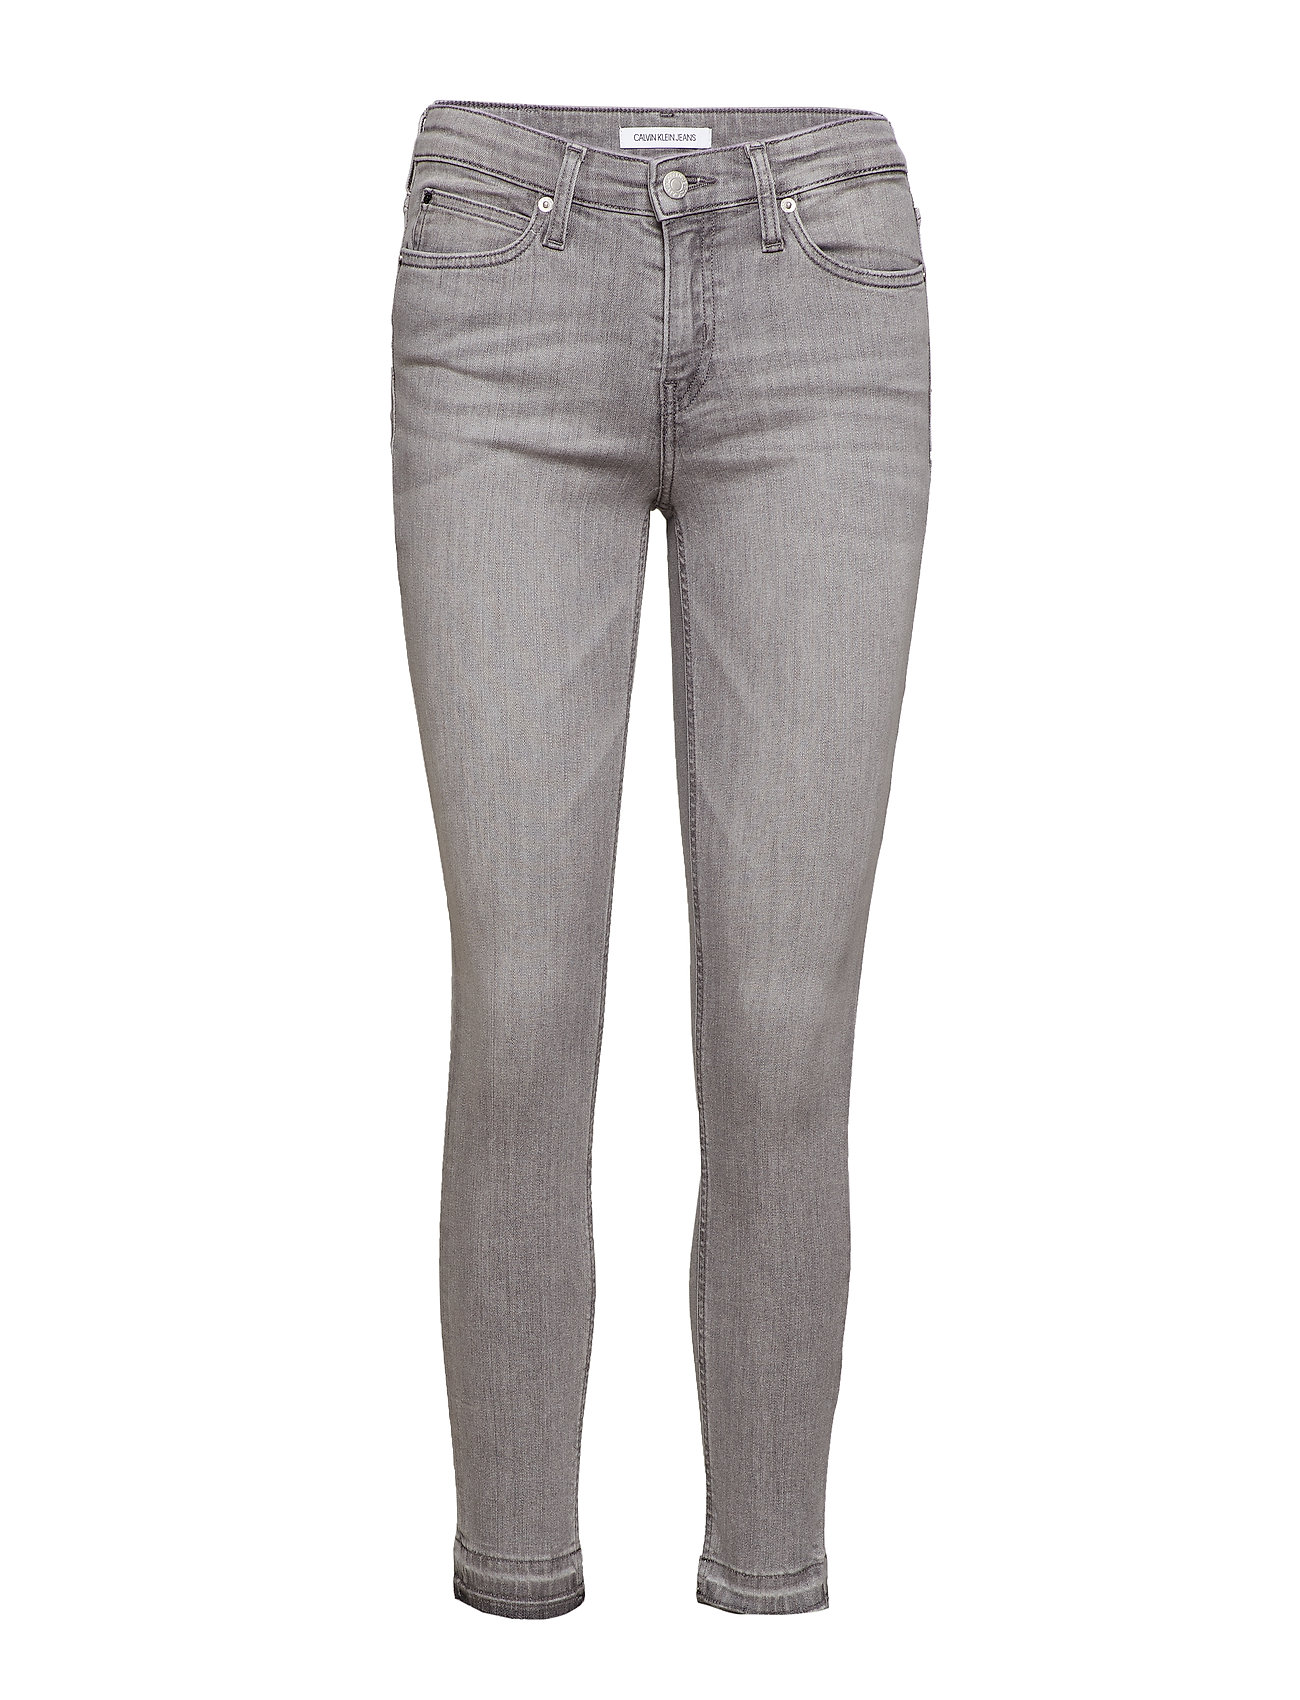 Calvin Klein Jeans CKJ 011 MID RISE SKI - ANGOLA GREY RELEASED HEM